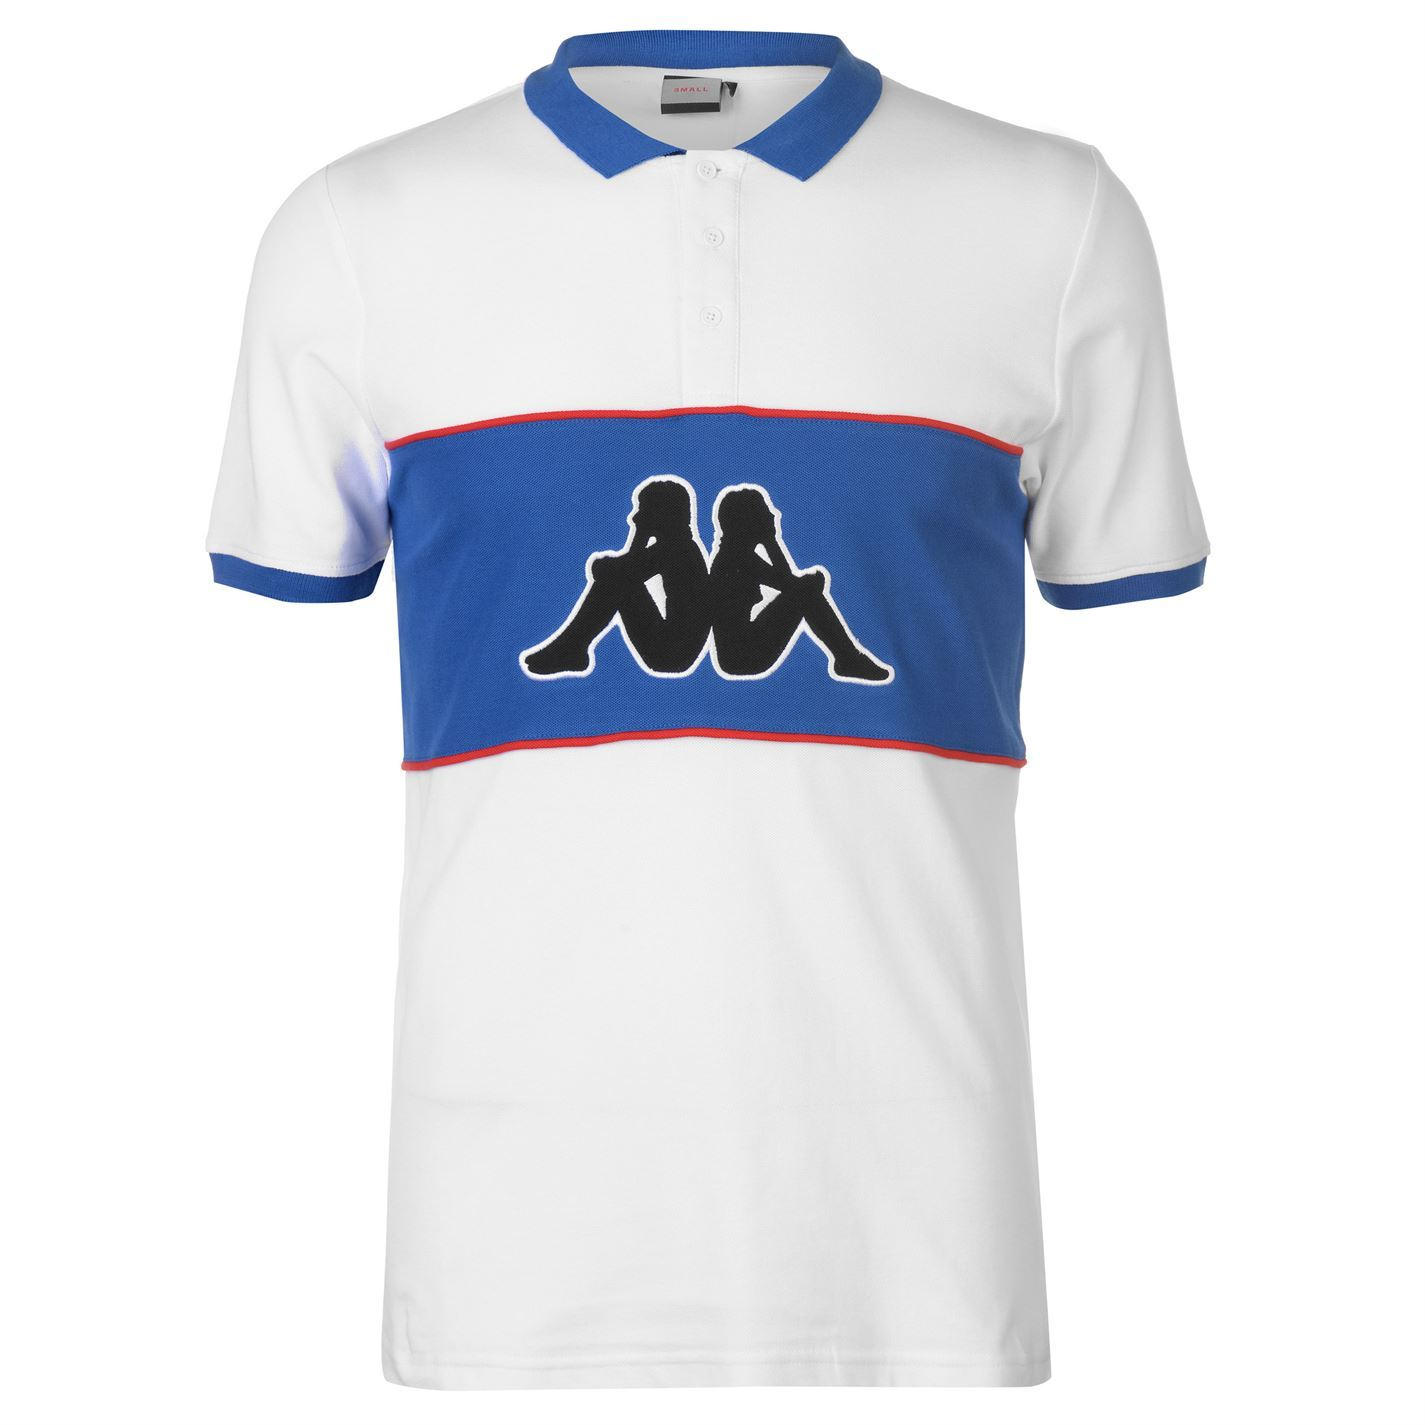 b40d1648fb Kappa Mens Panel Polo Shirt Classic Fit Tee Top Short Sleeve Cotton Button